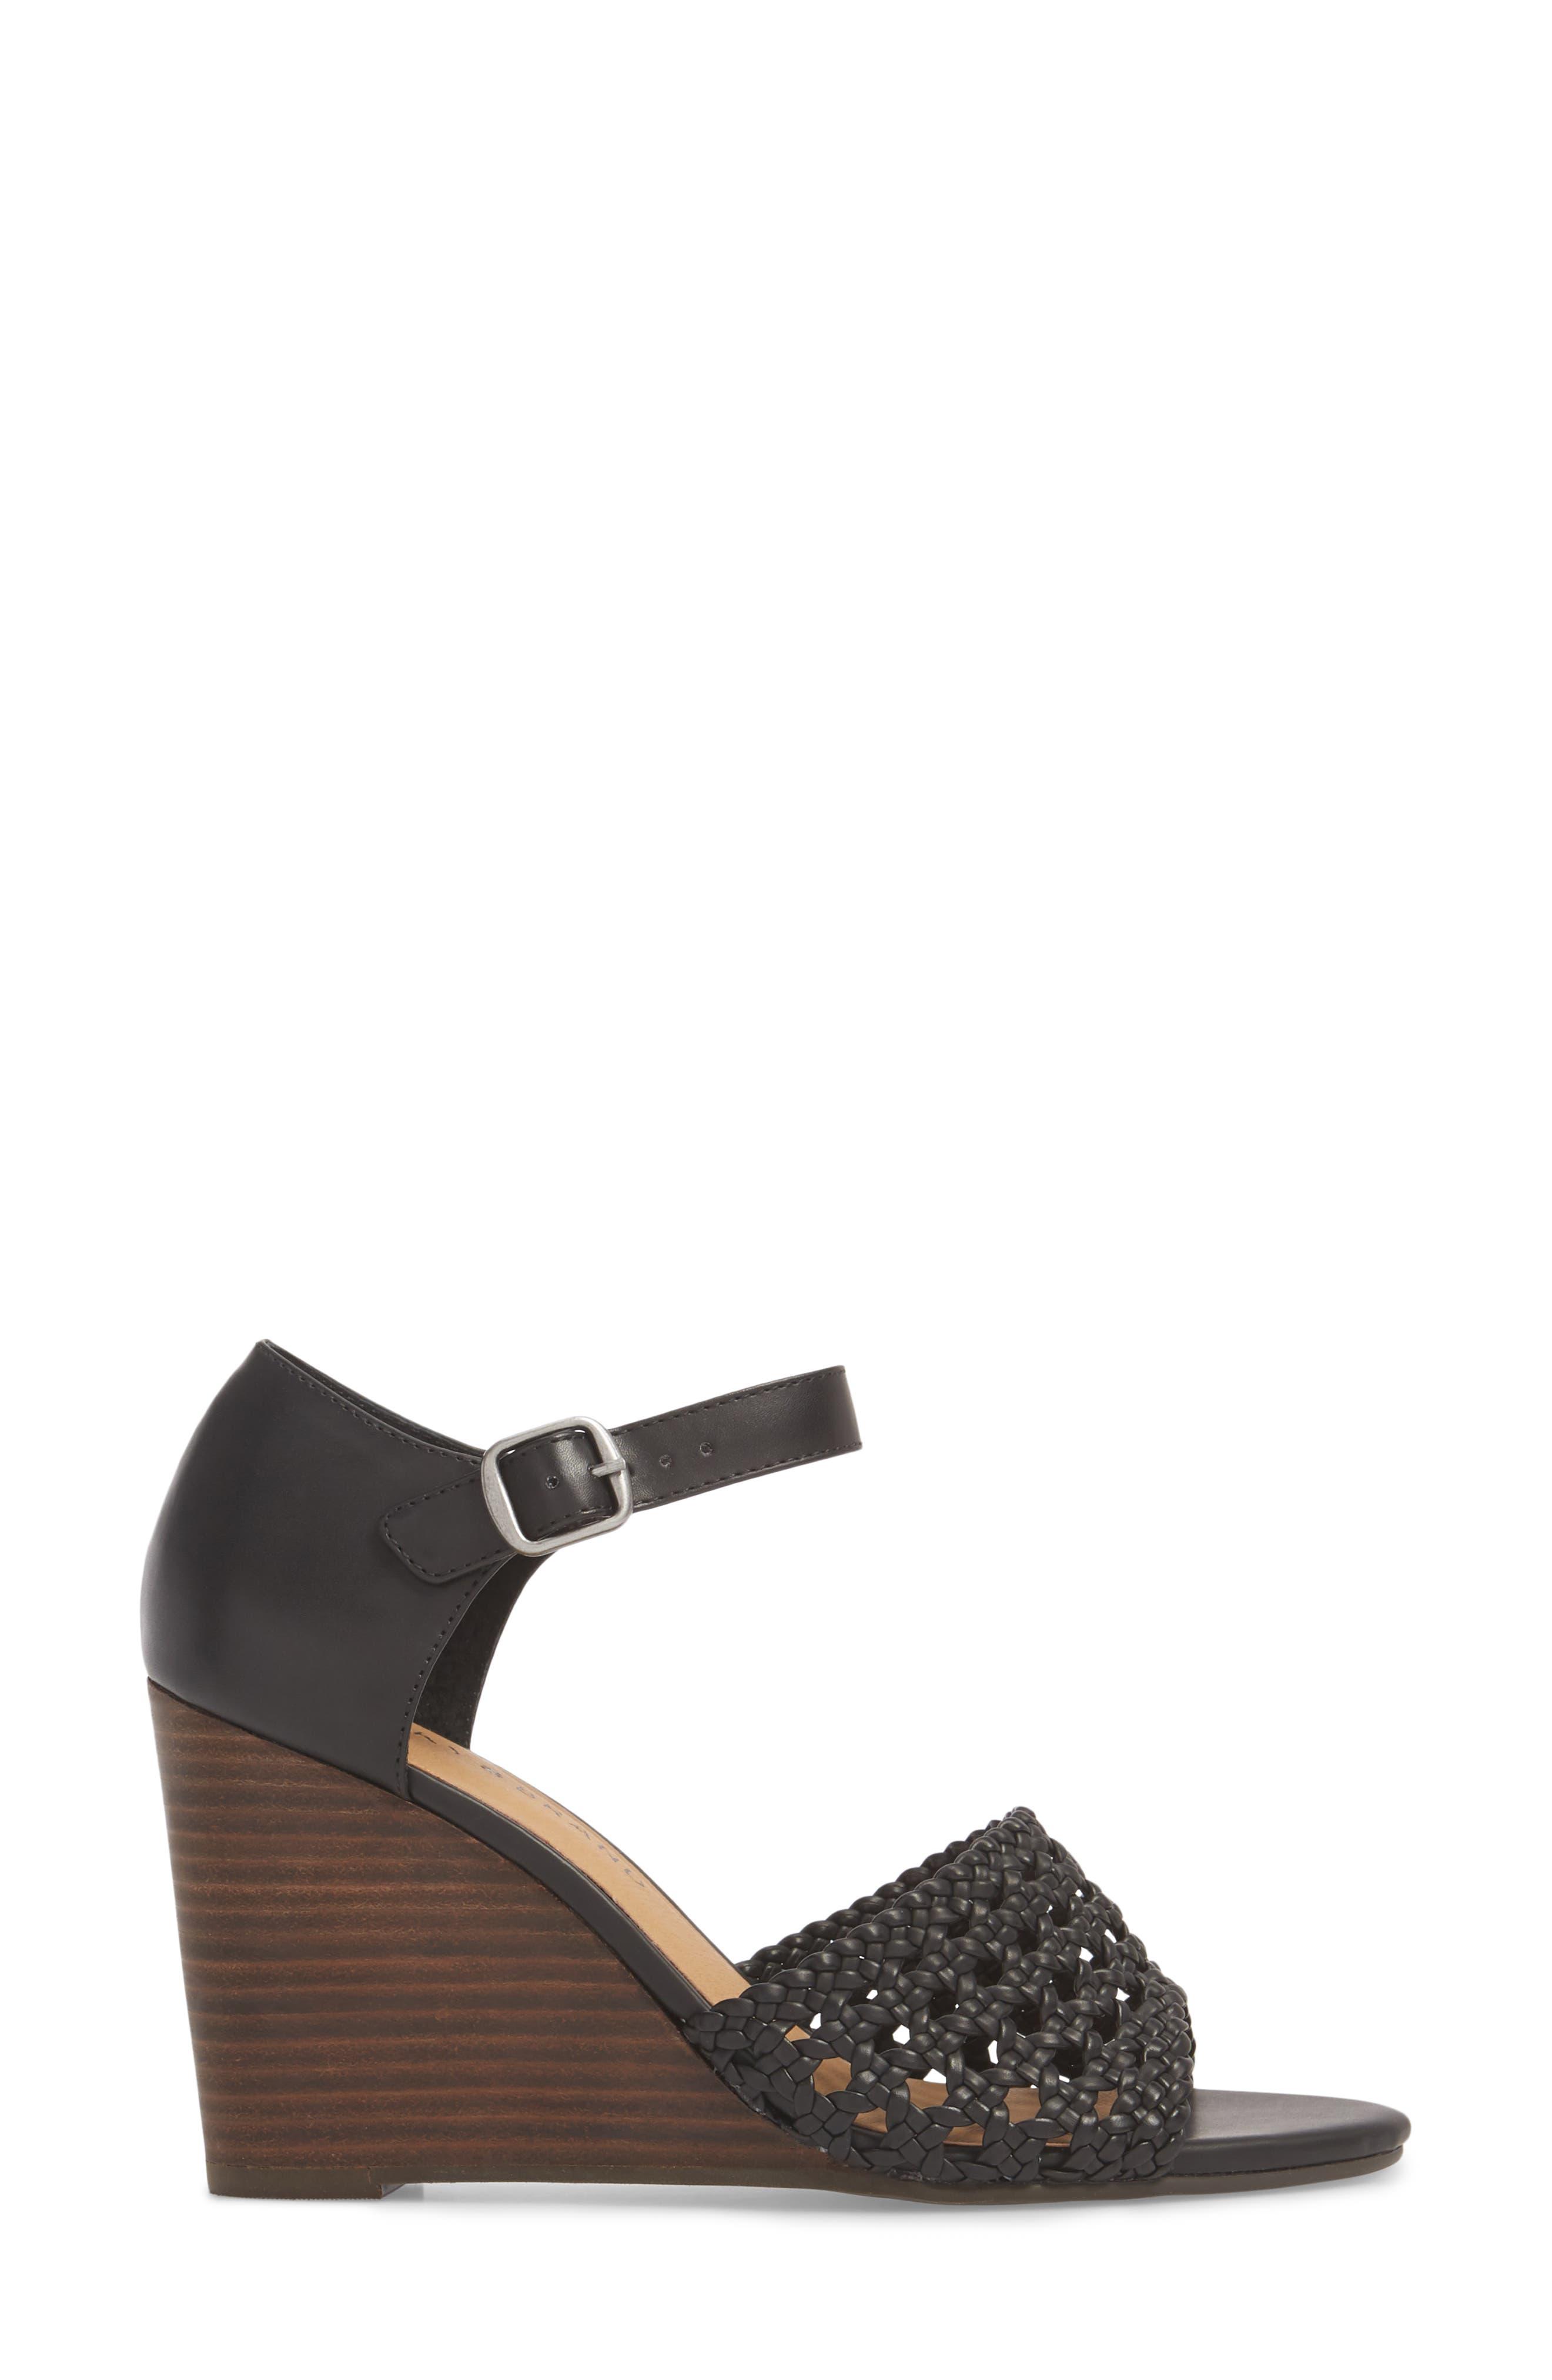 Rabekka Wedge Sandal,                             Alternate thumbnail 3, color,                             BLACK LEATHER